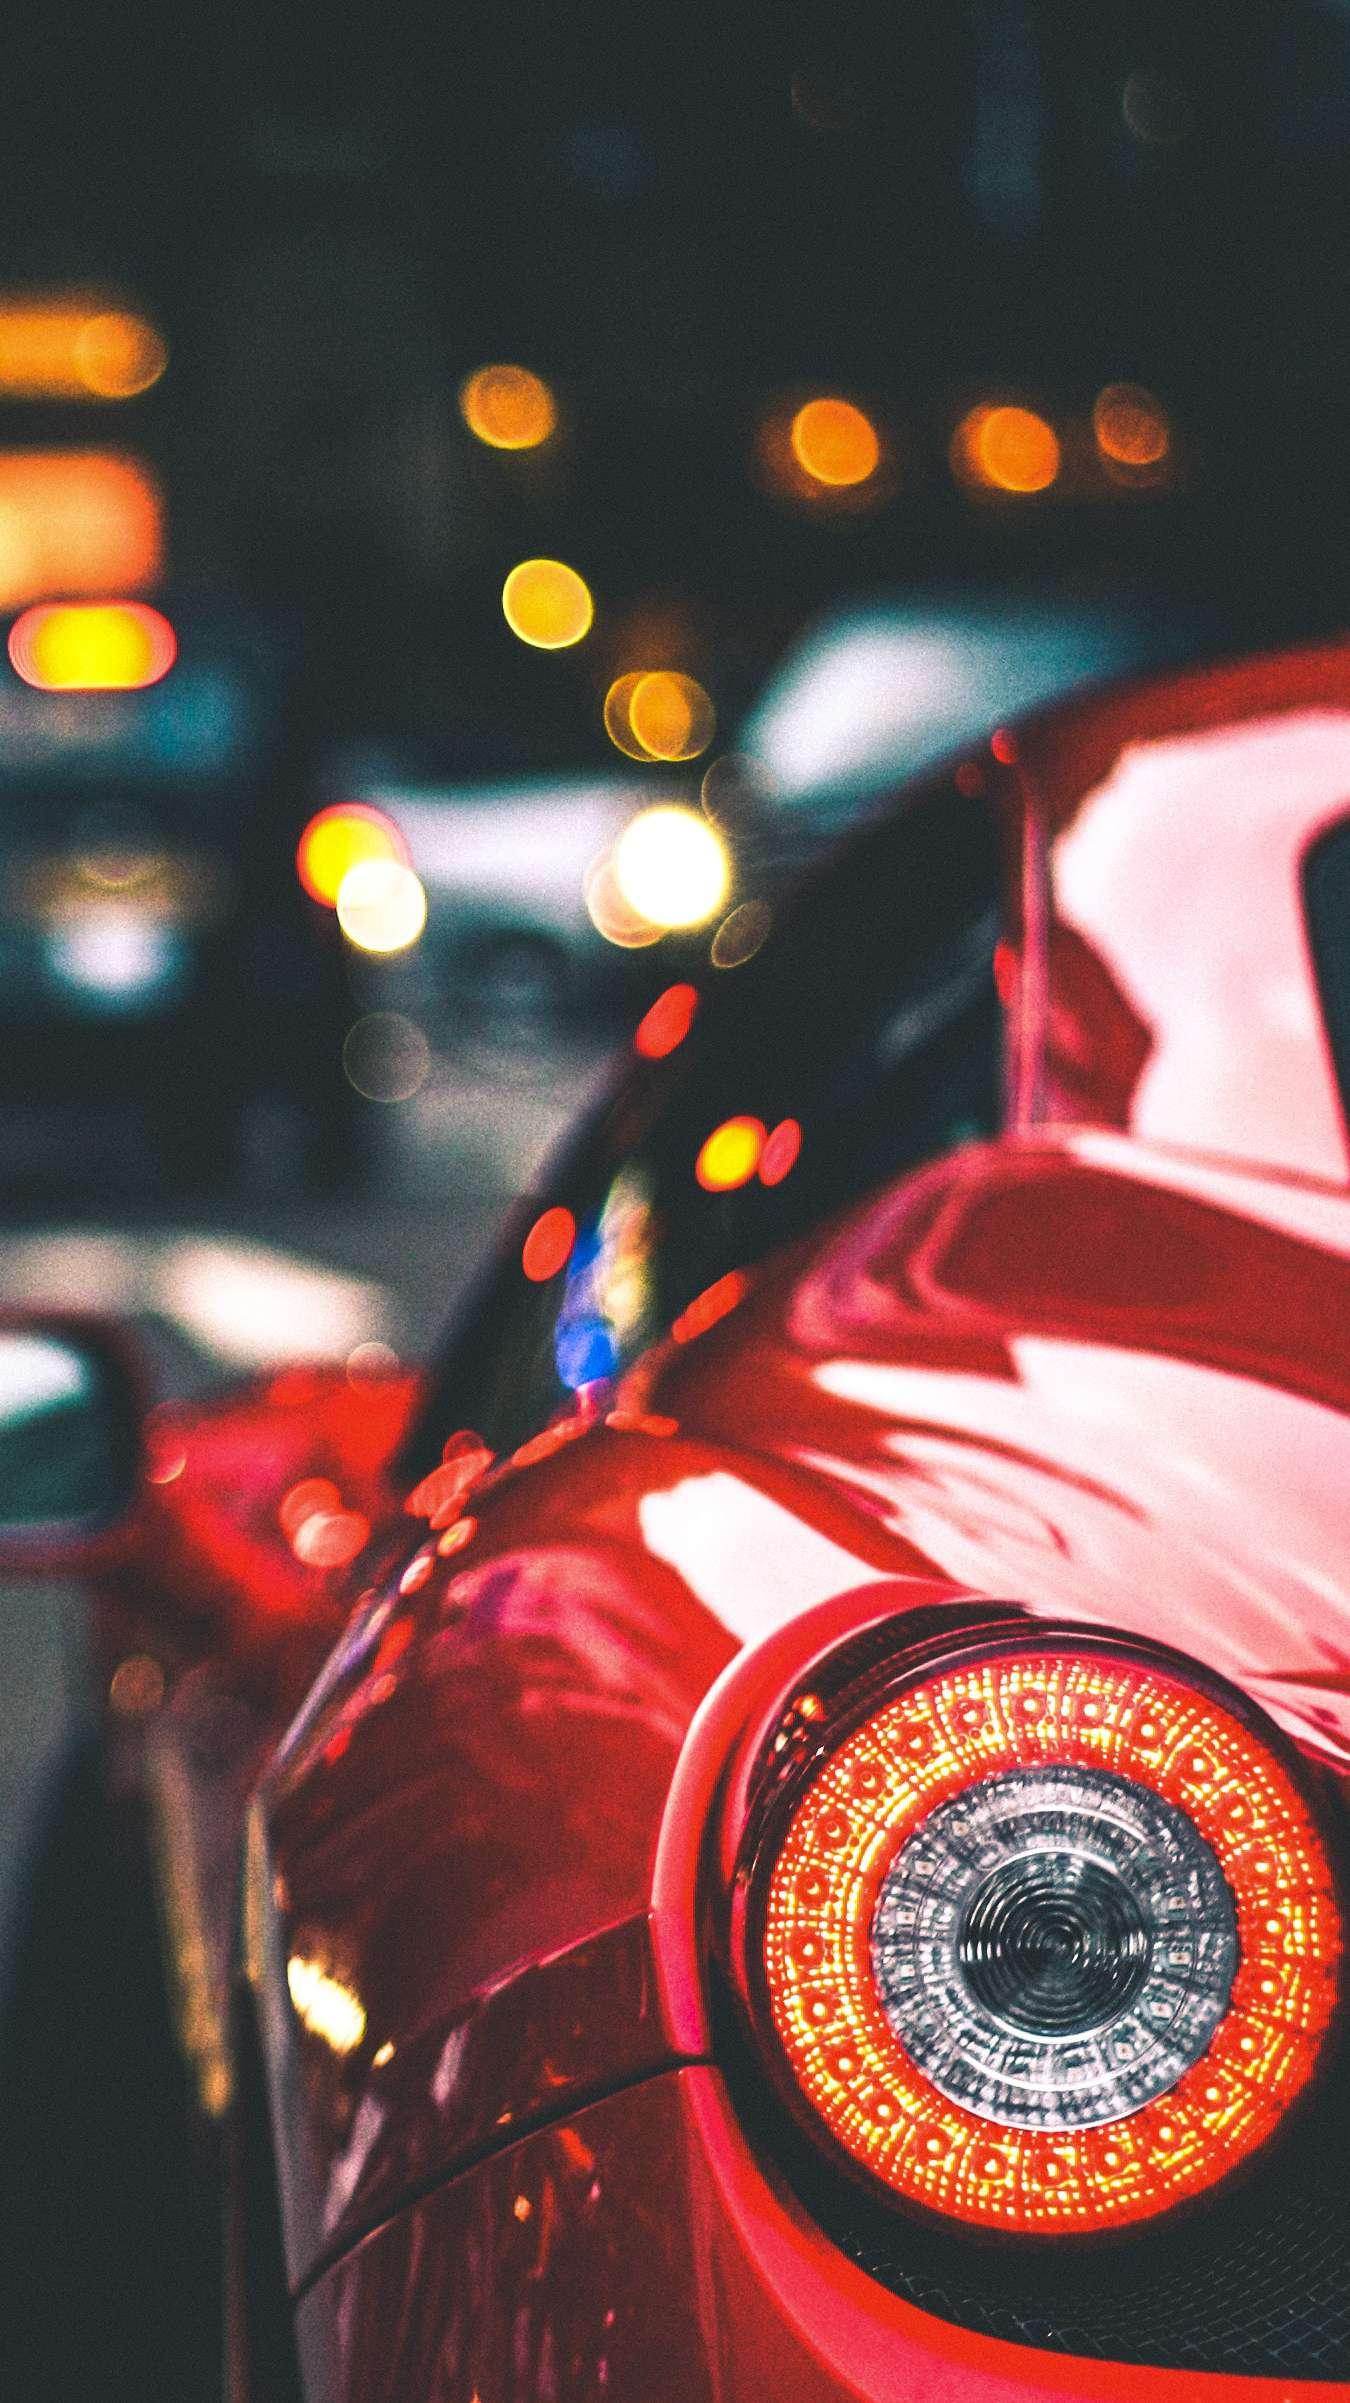 Ferrari Car Back Light iPhone Wallpaper